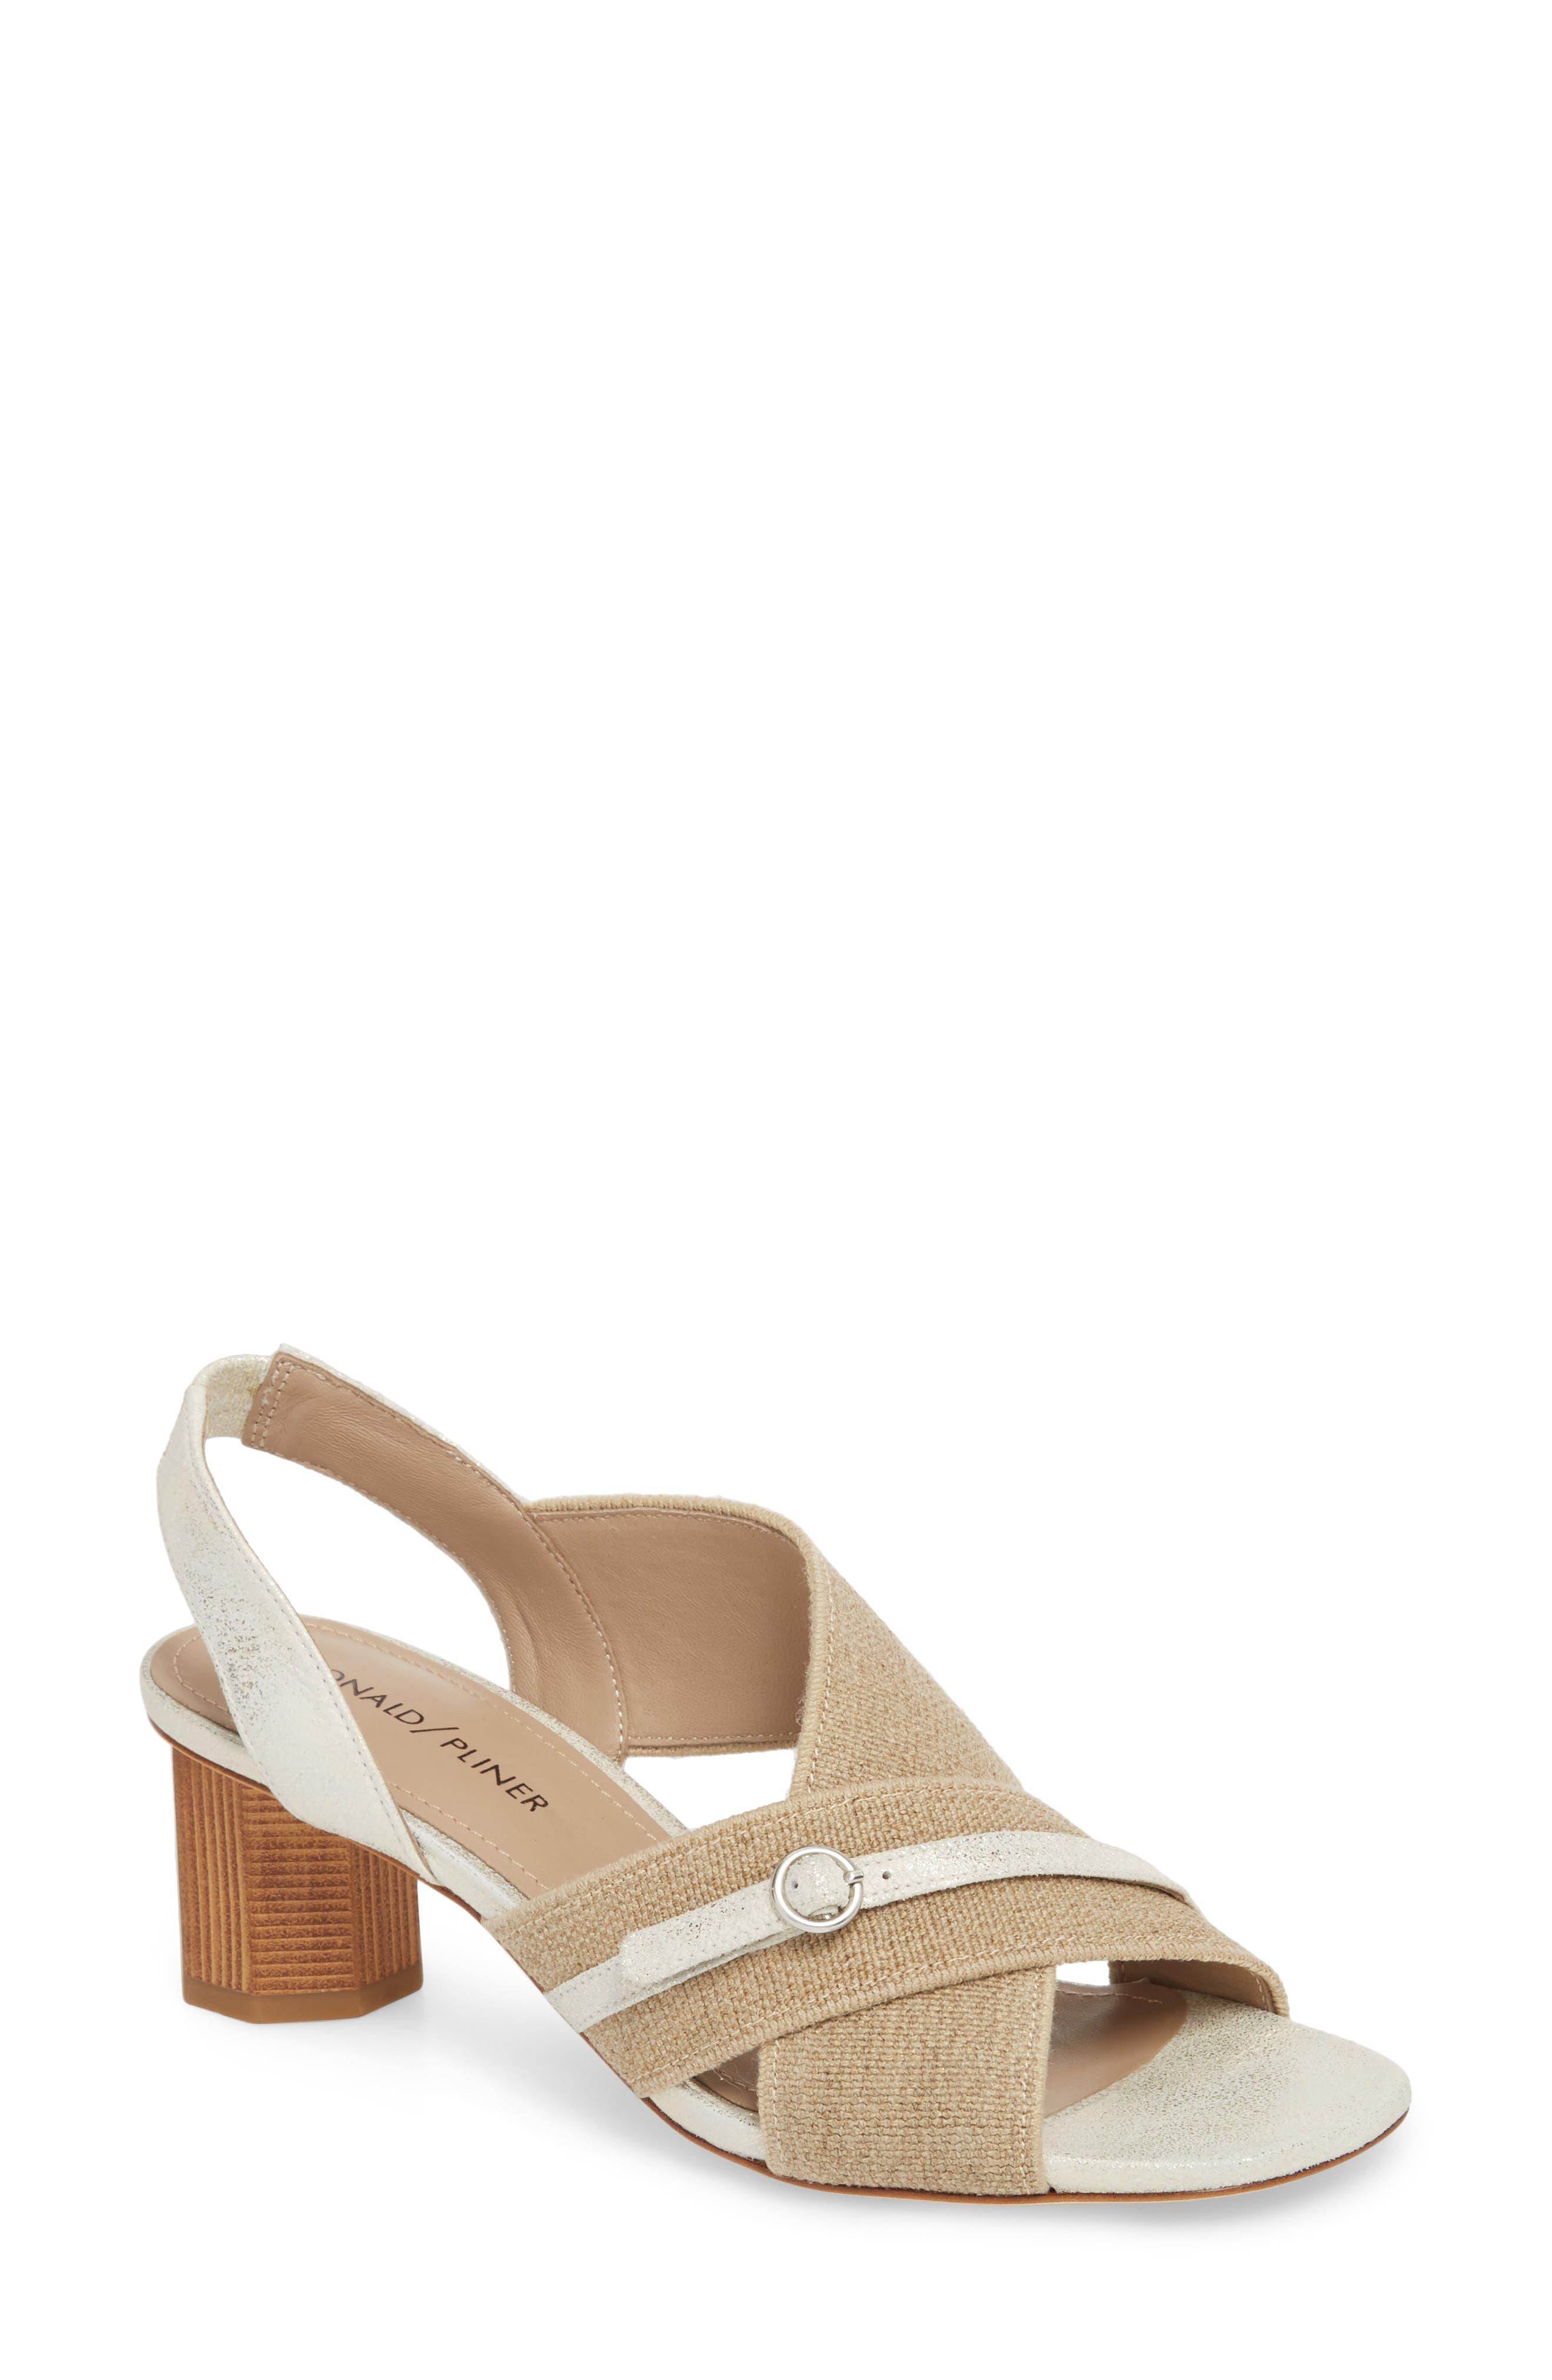 Radly Strappy Sandal,                         Main,                         color, 250